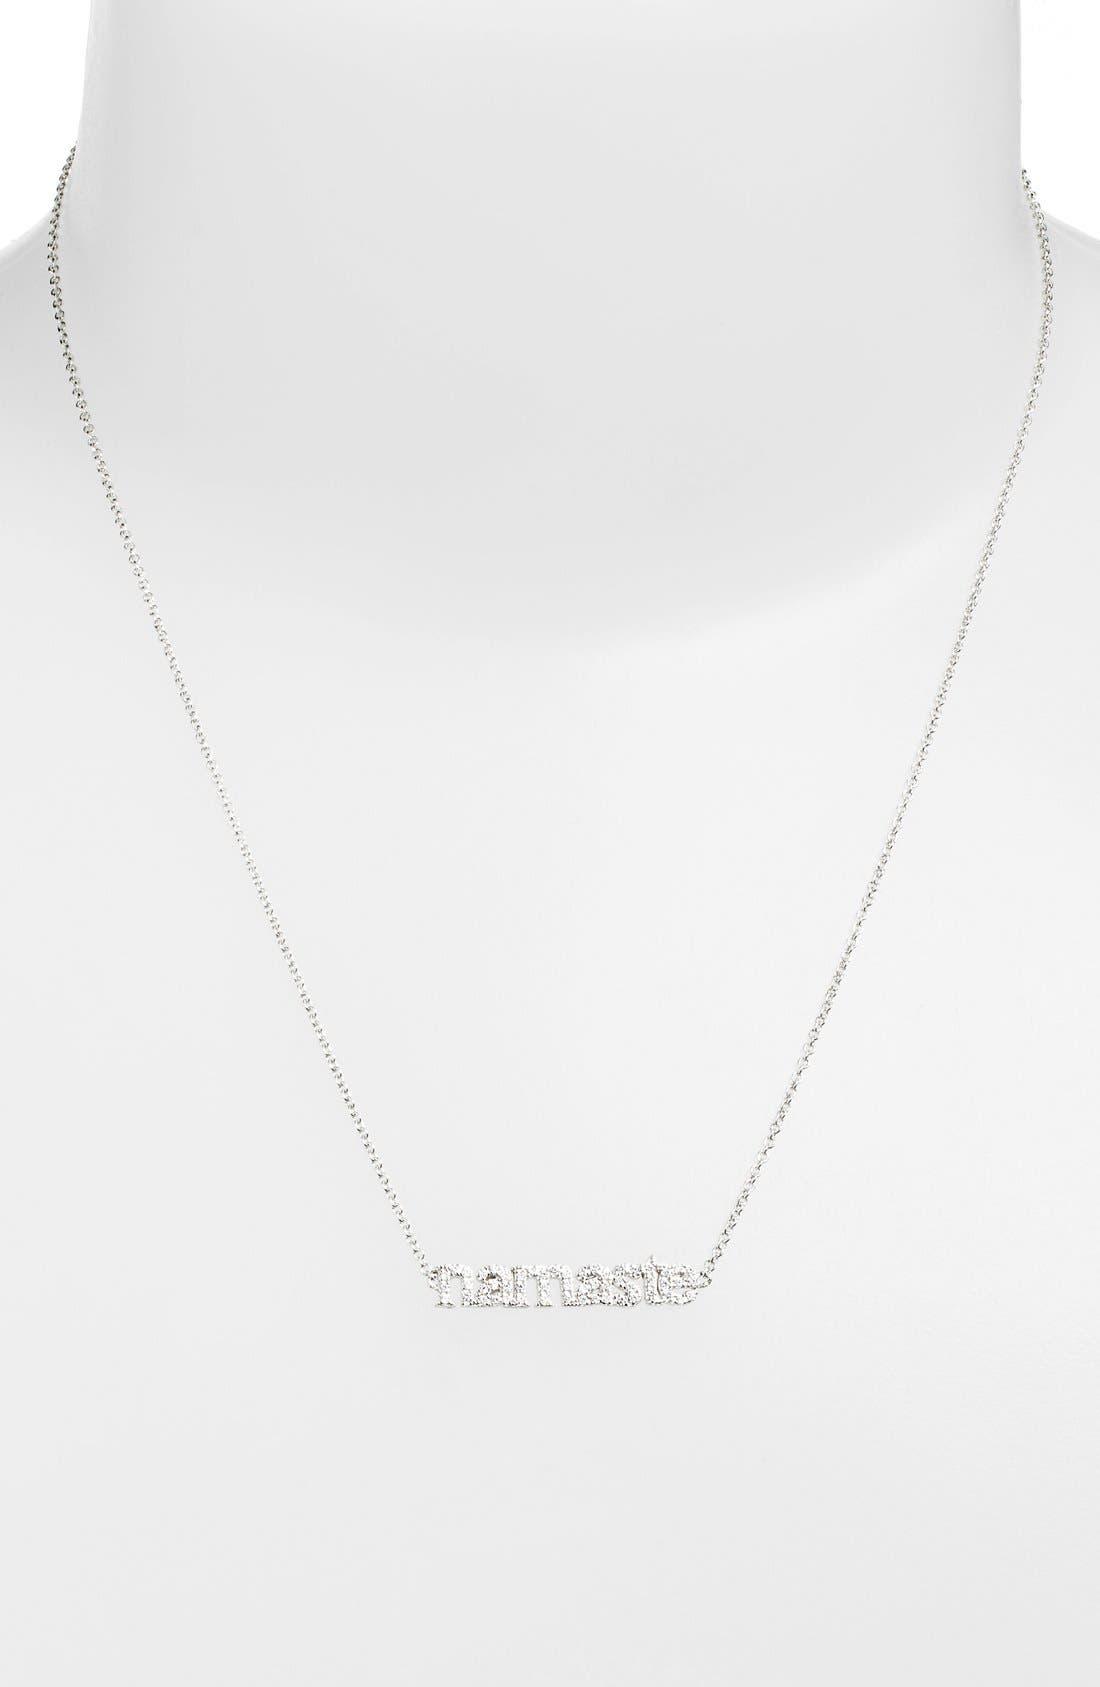 Main Image - Sugar Bean Jewelry 'Namaste' Pendant Necklace